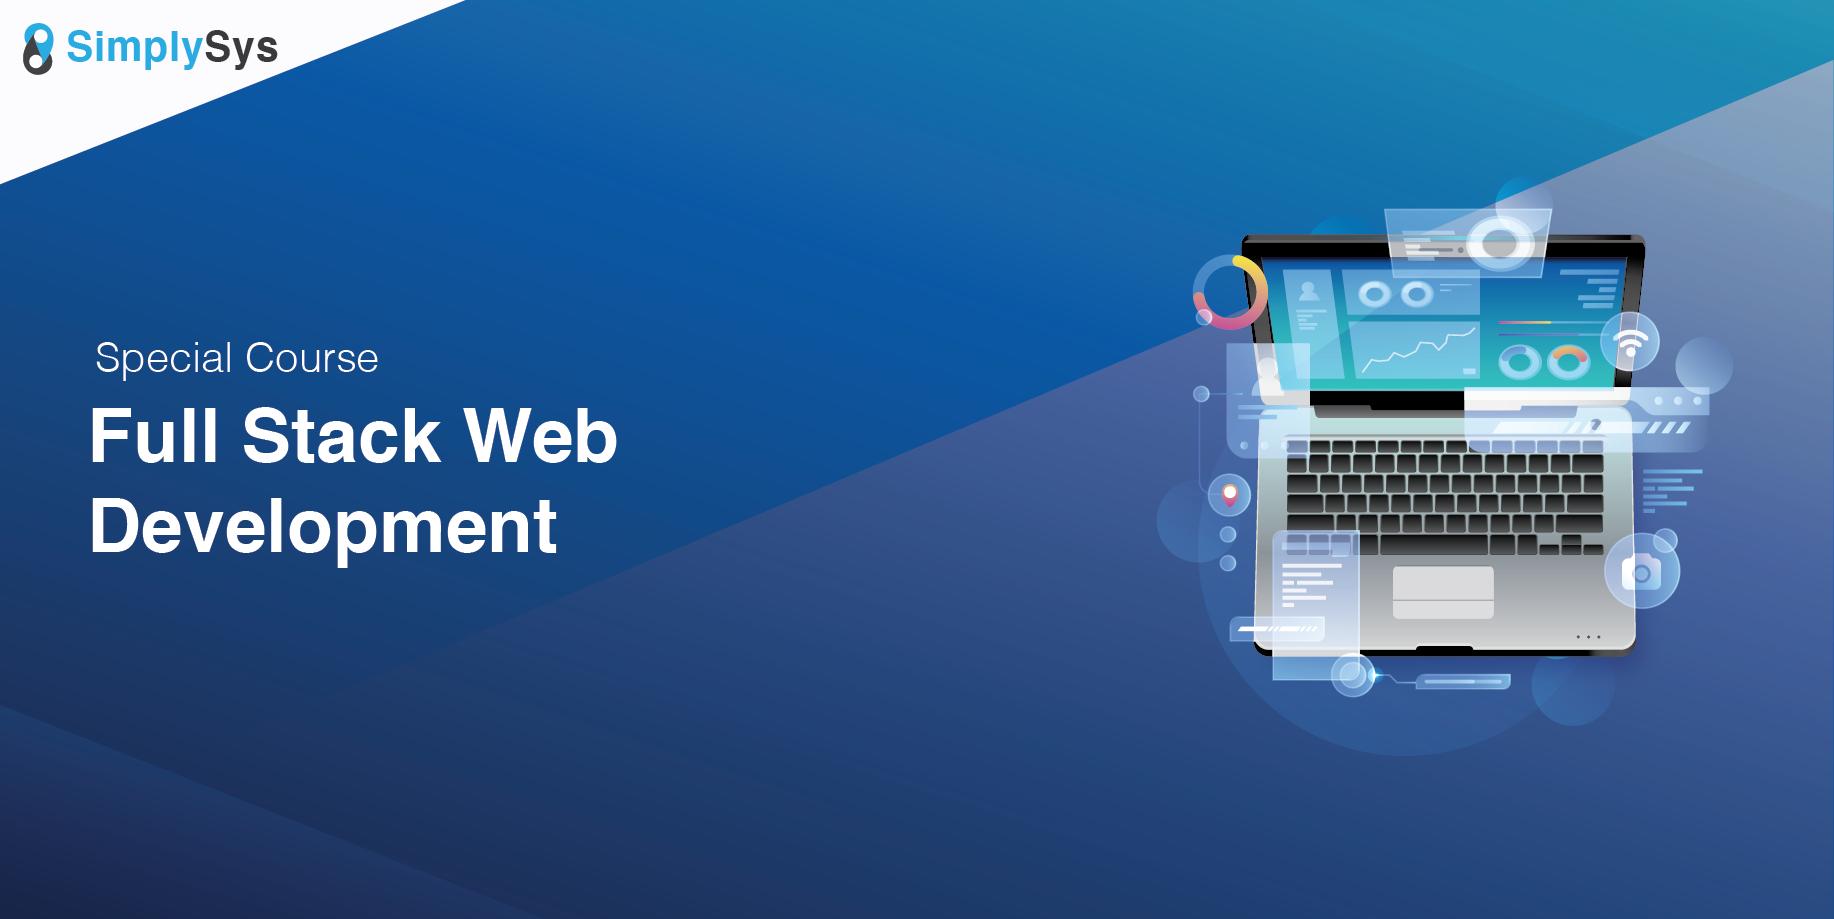 Training Full Stack Web Development